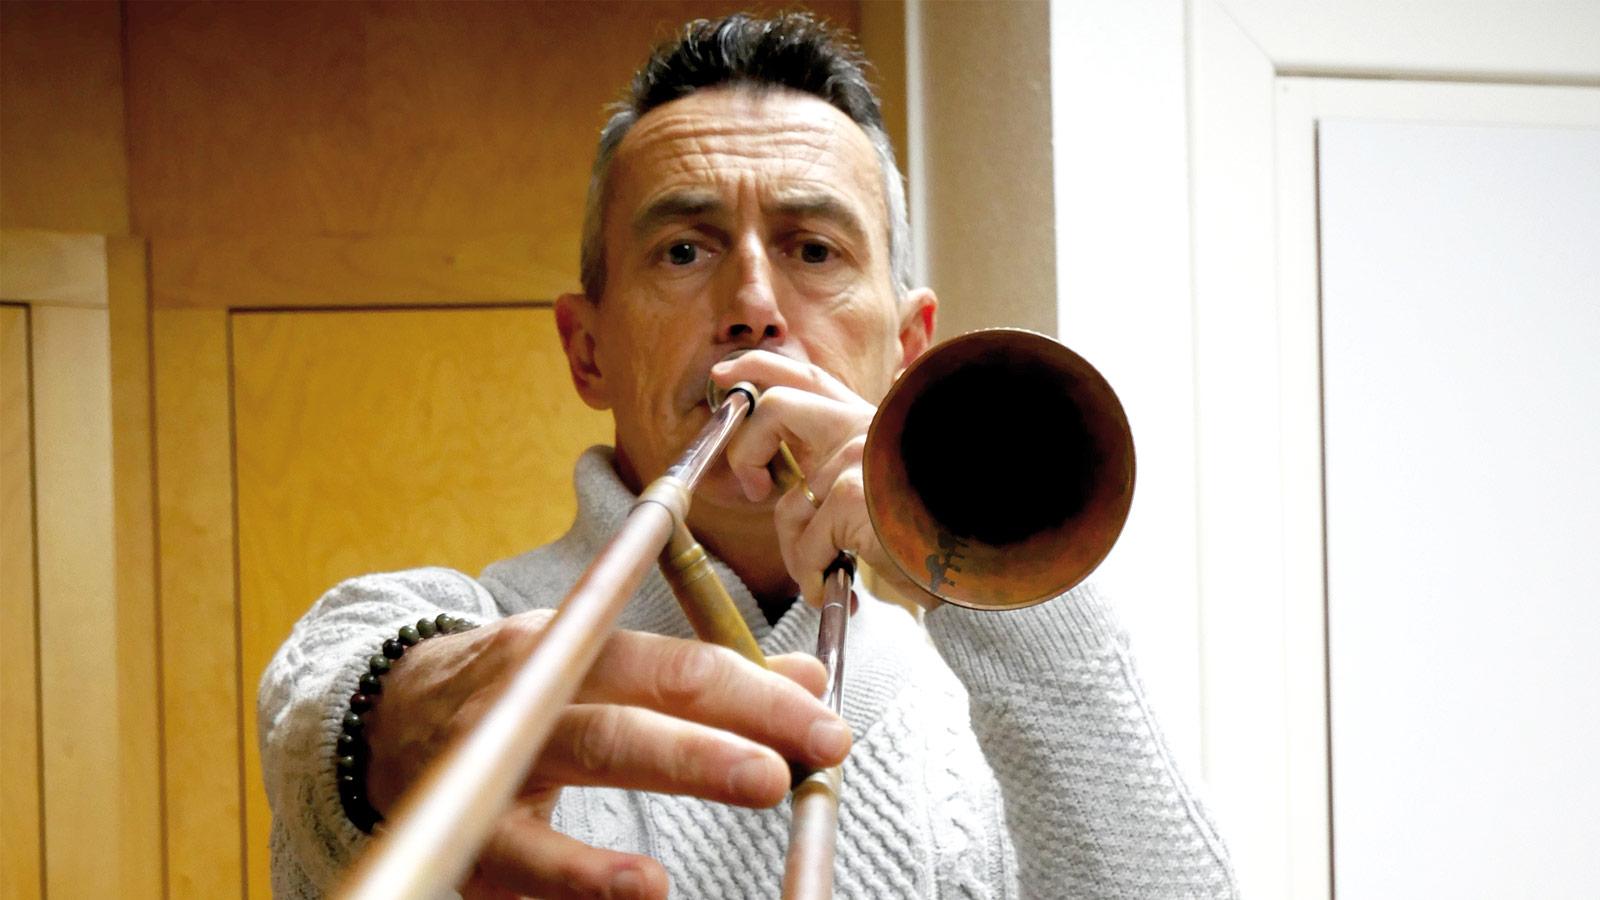 Jean-Yves Monier – Professeur de sacqueboute